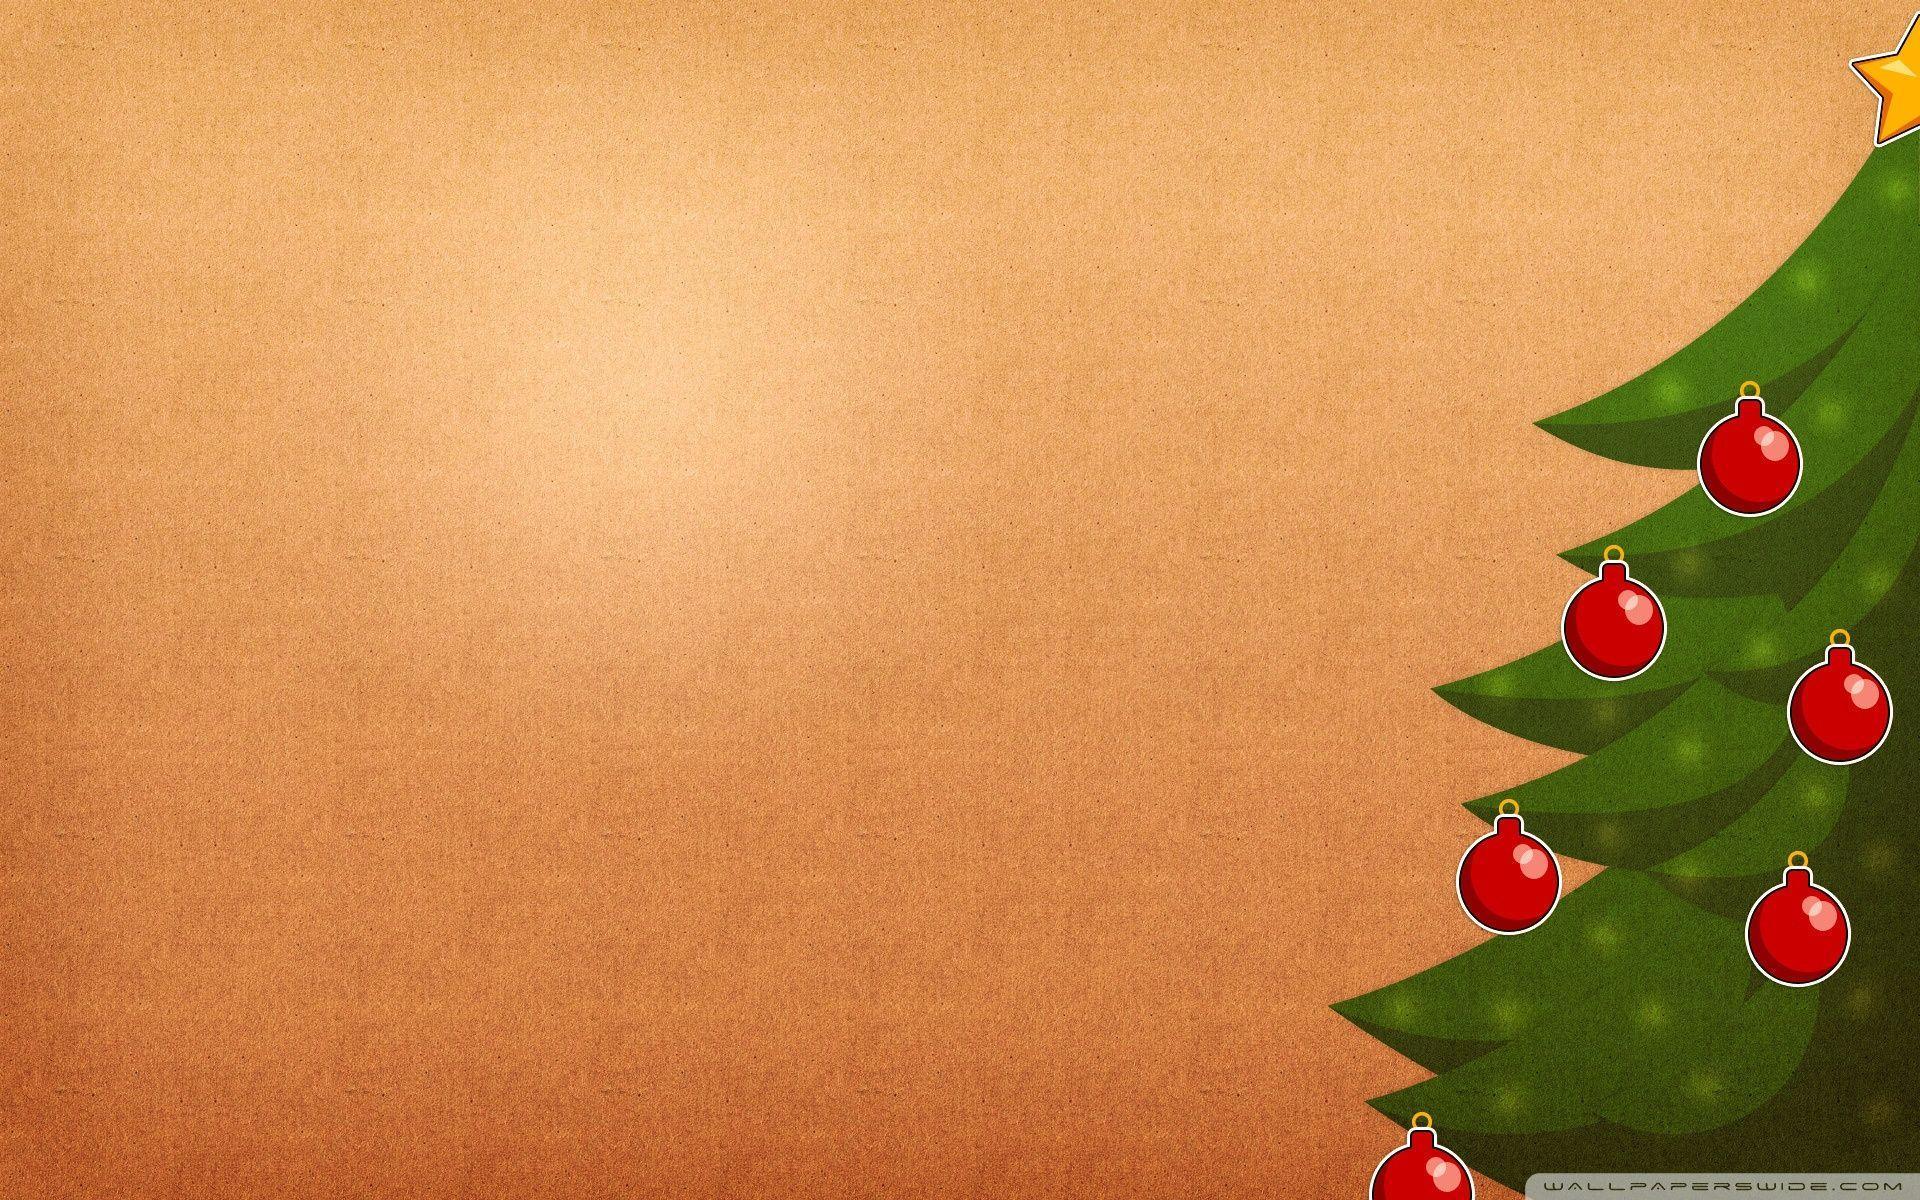 Christmas Tree Vintage Wallpapers Top Free Christmas Tree Vintage Backgrounds Wallpaperaccess